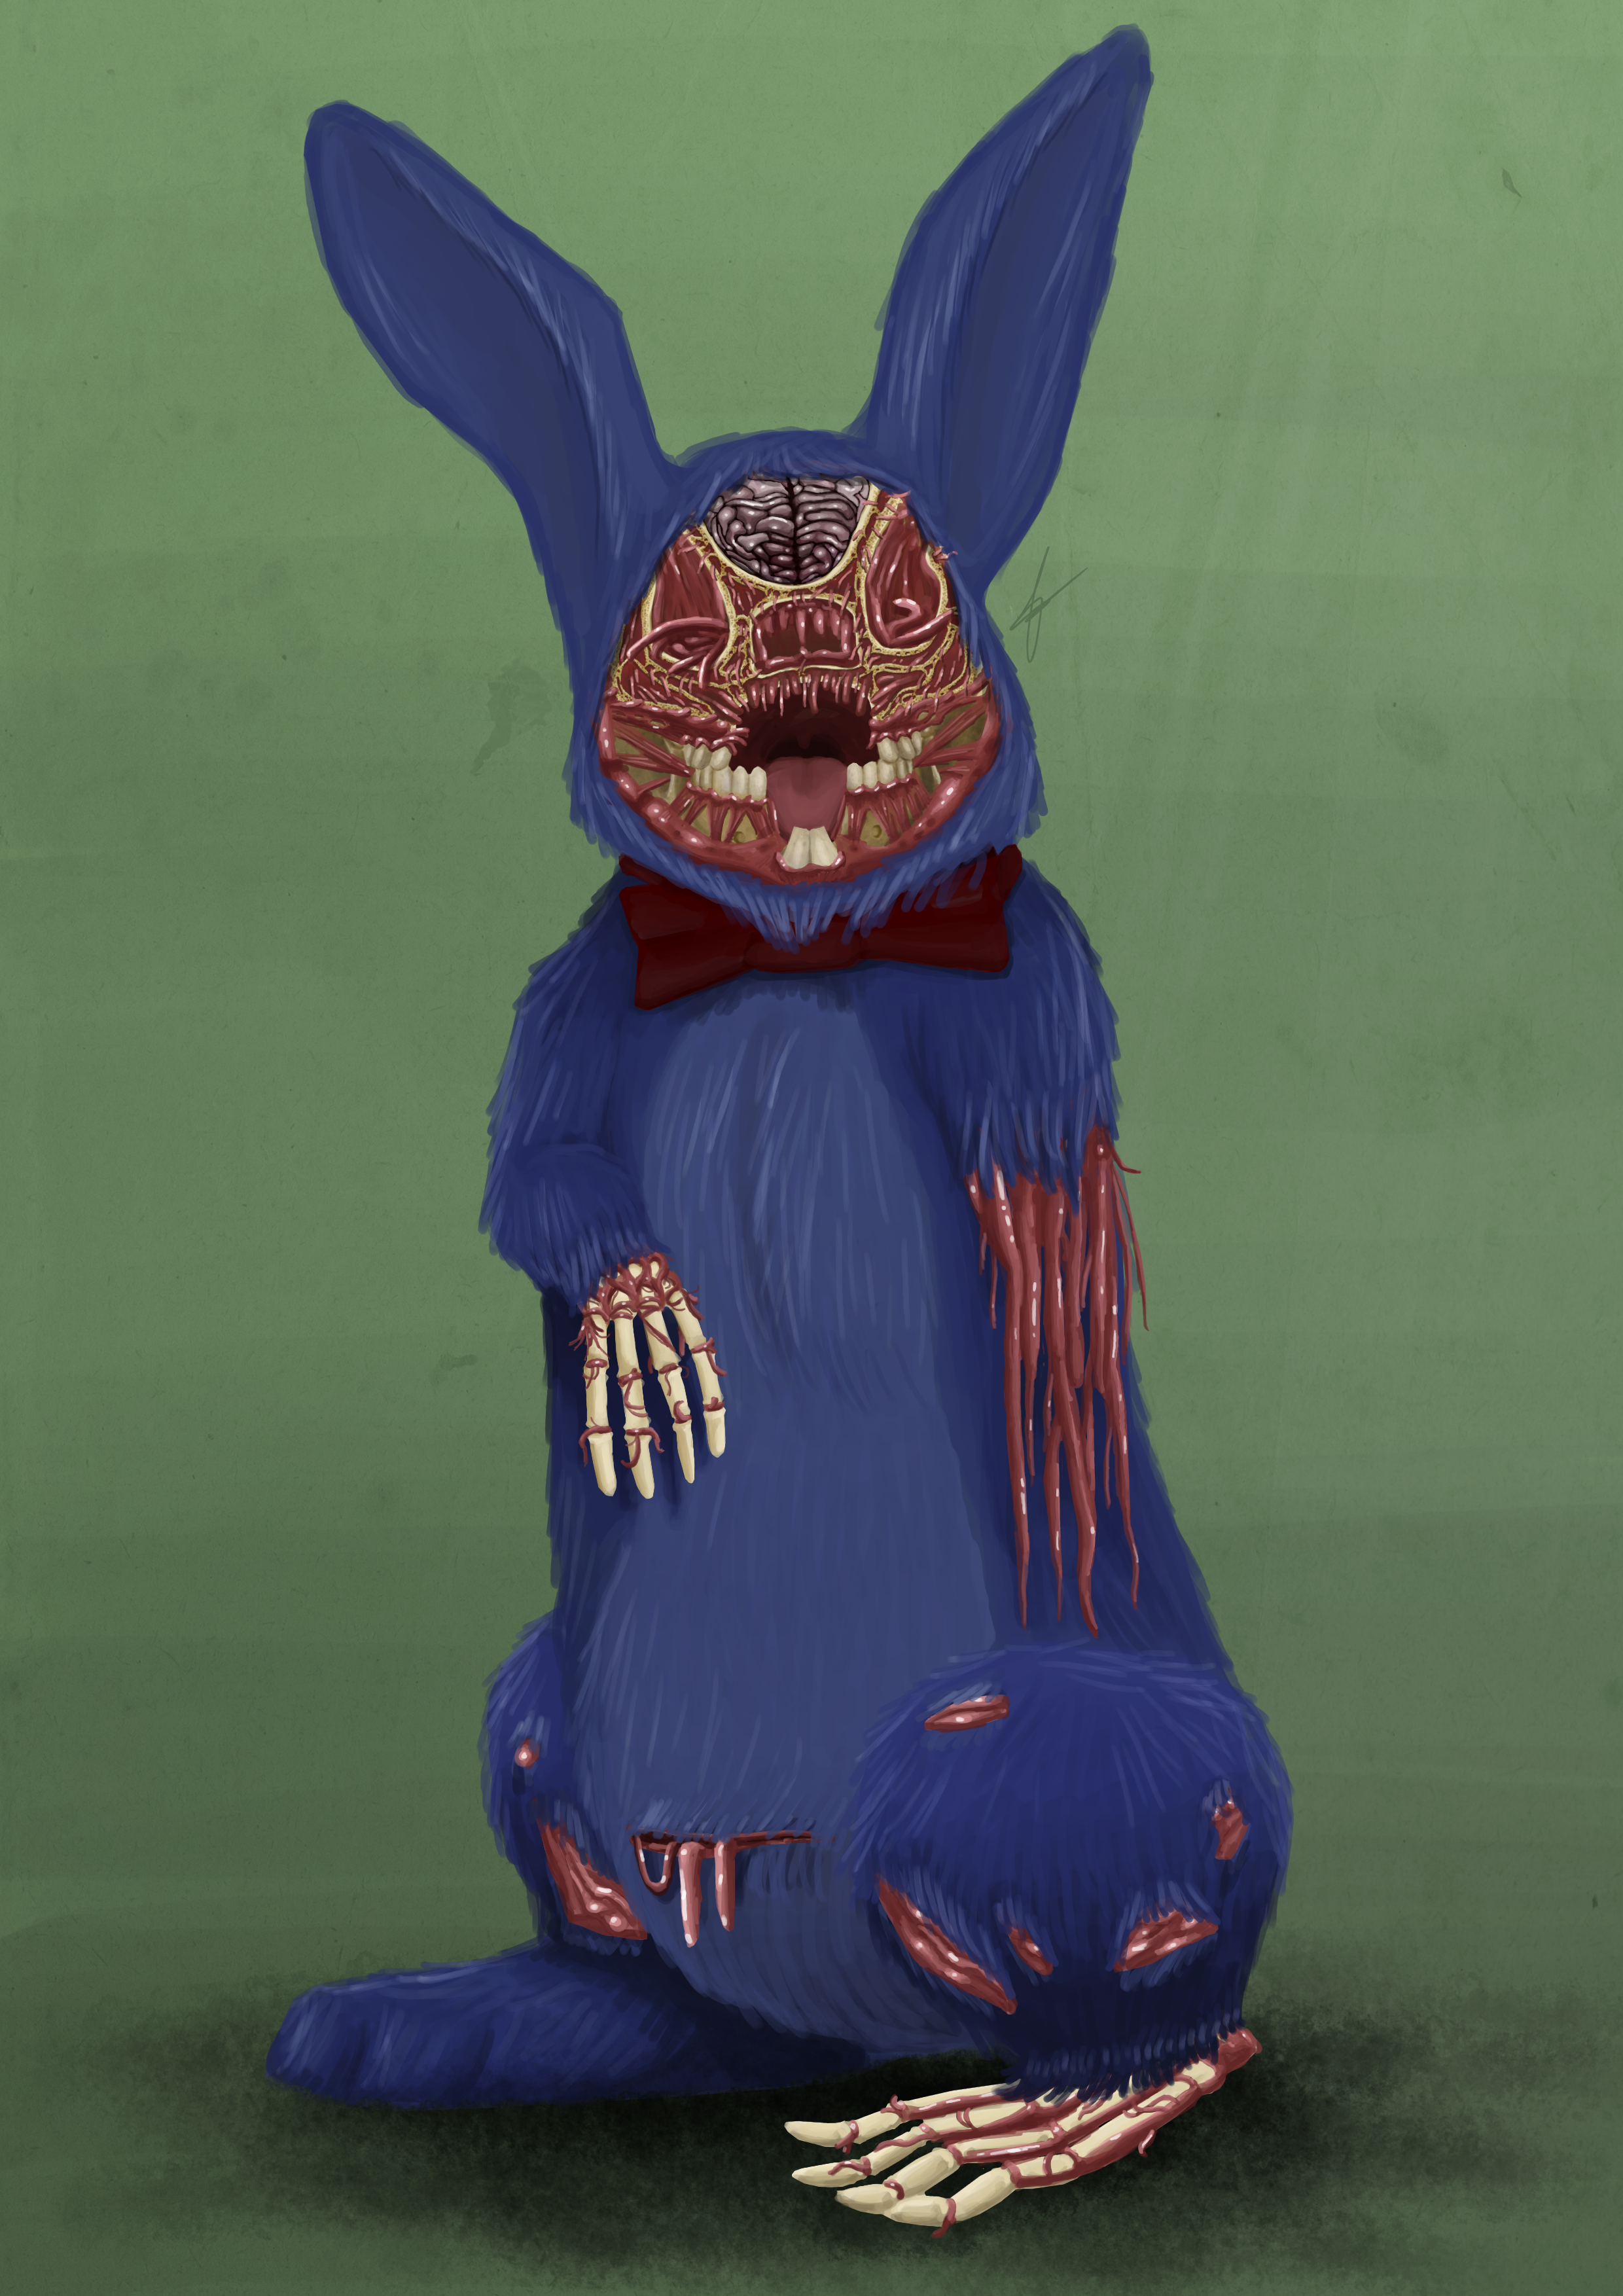 Freddy, my fucking face is gone